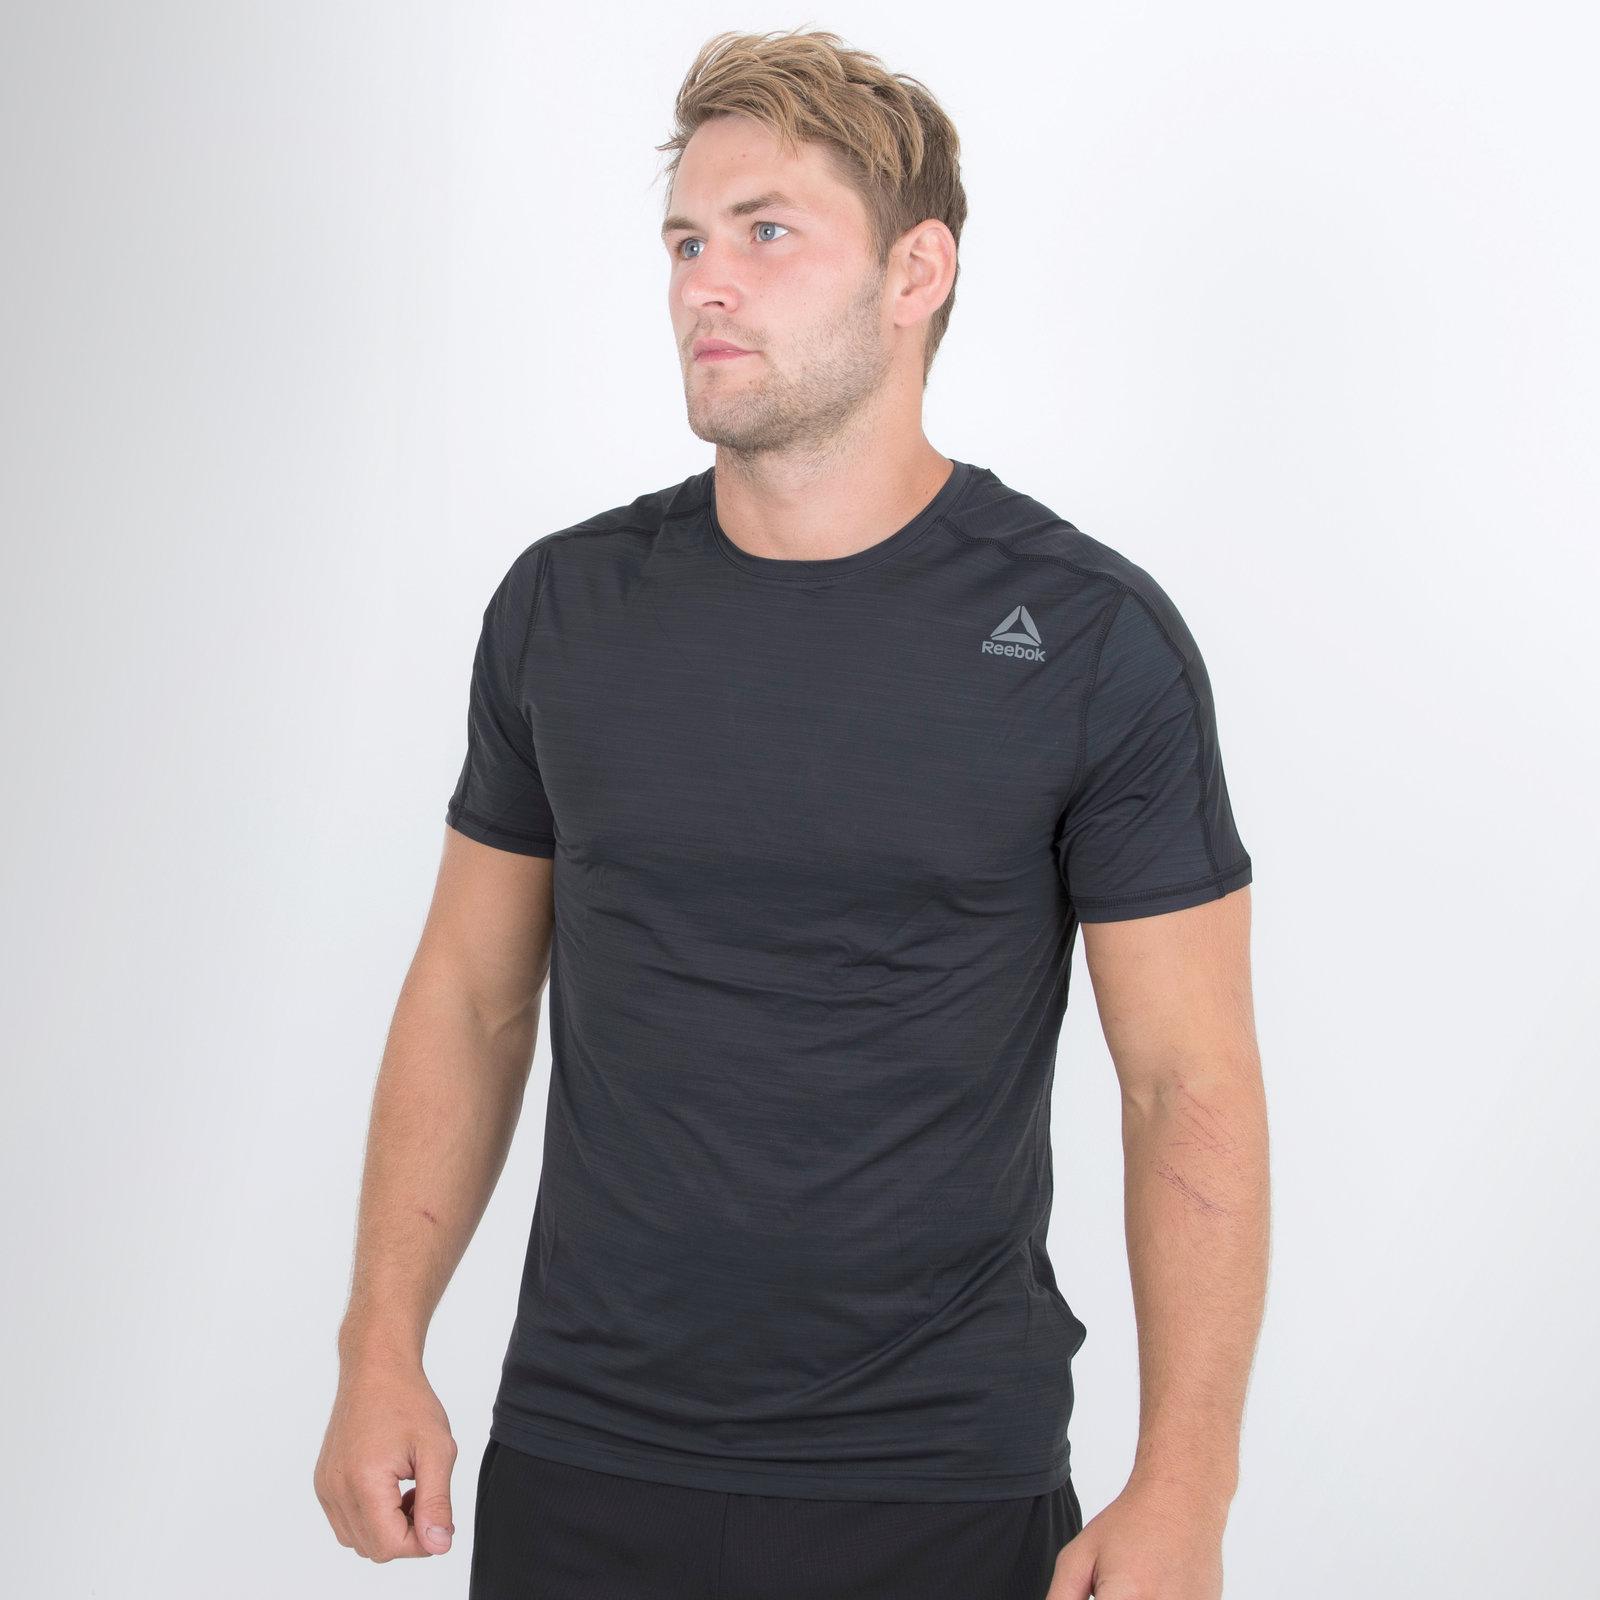 Image of Activchill Move S/S Training T-Shirt